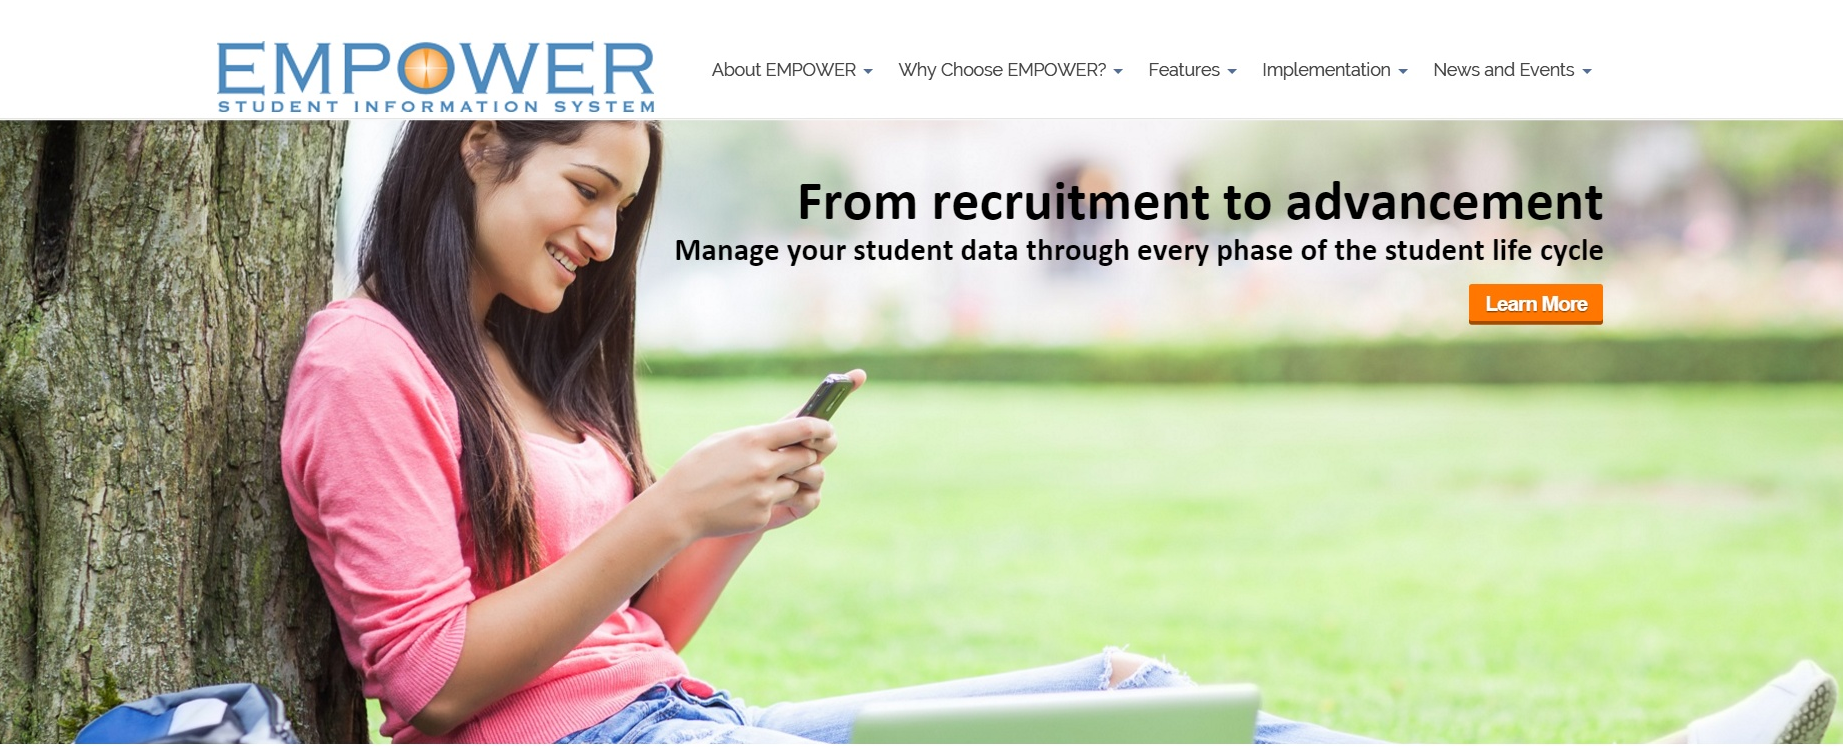 EMPOWER Student Information System